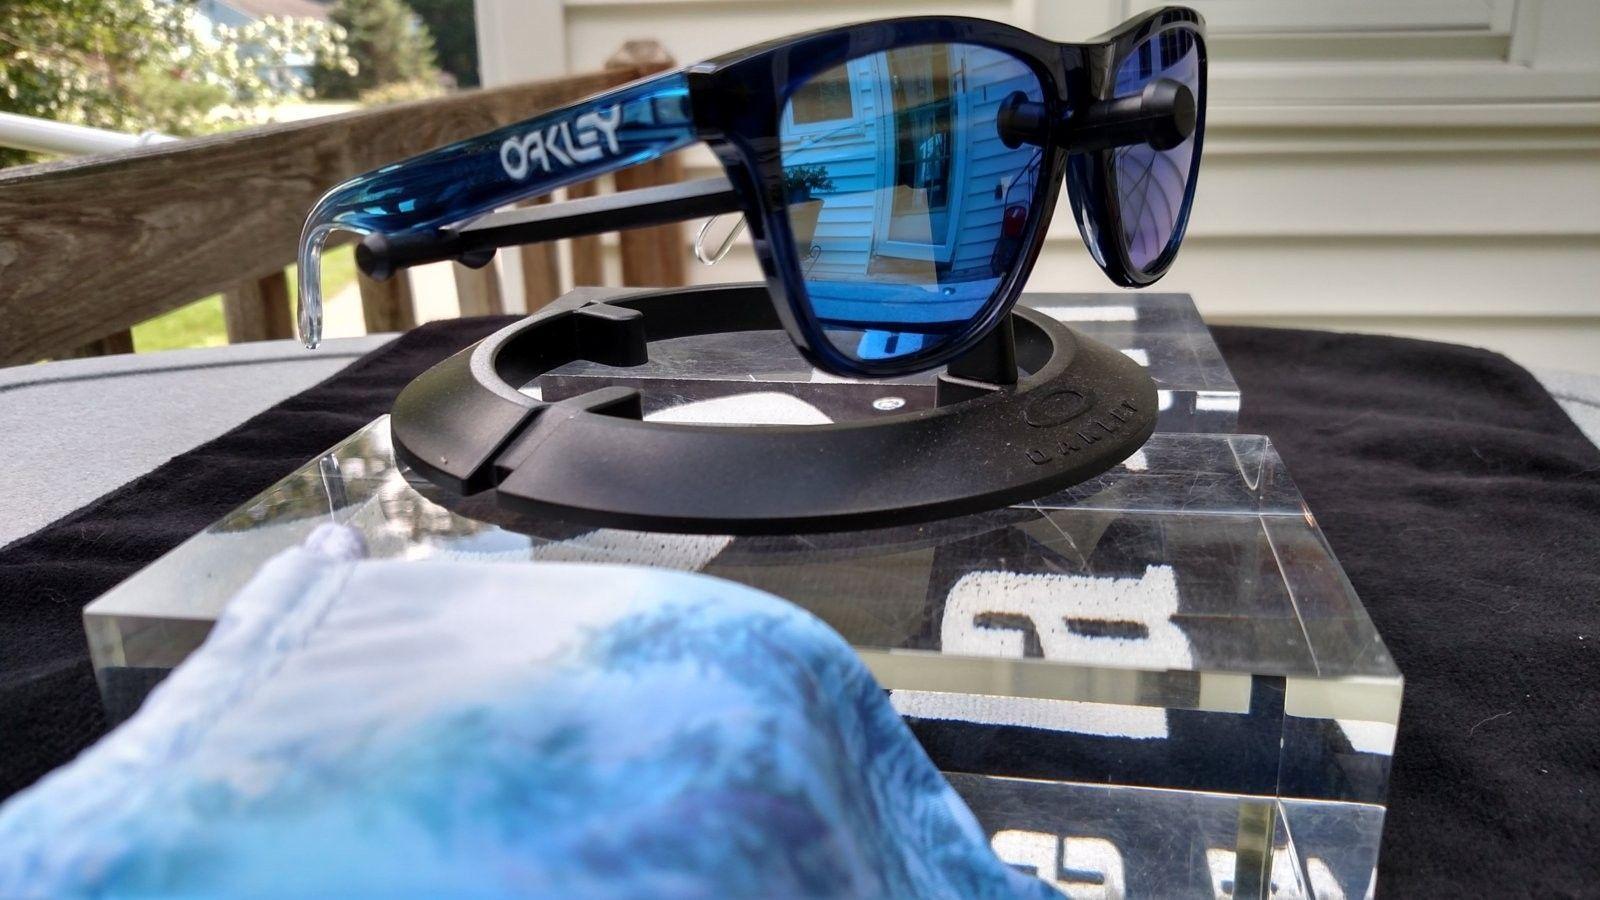 Snow Alpine Collection - - - Bluebird w/ Sapphire Iridium -BNIB and  price drop - IMG_20160729_154222423_HDR.jpg